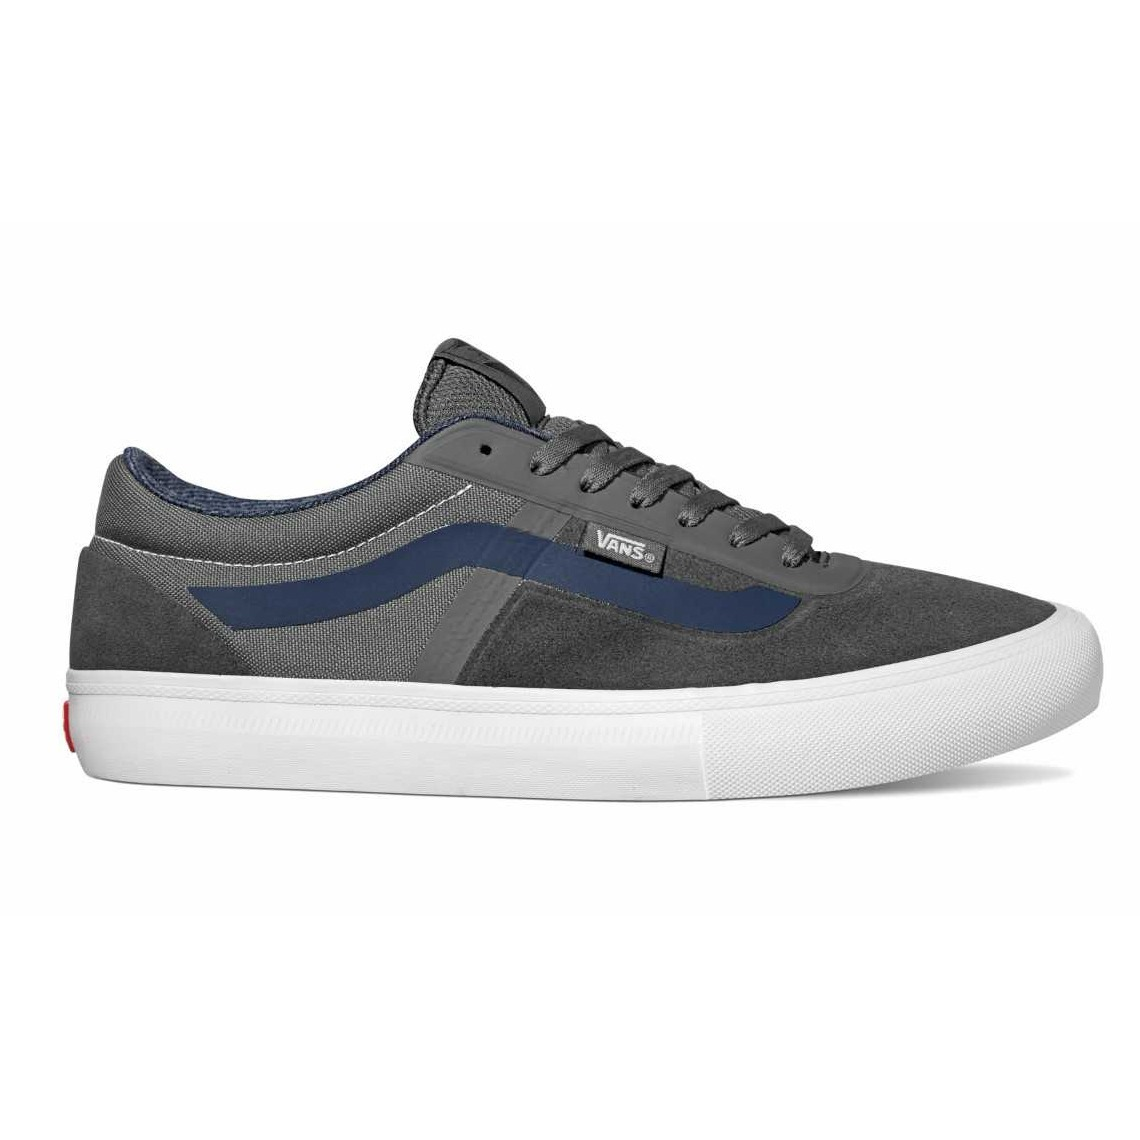 1624061d6c079 Zapatillas Skate Vans Av Rapidweld Pro Hombre On Sports -   2.821